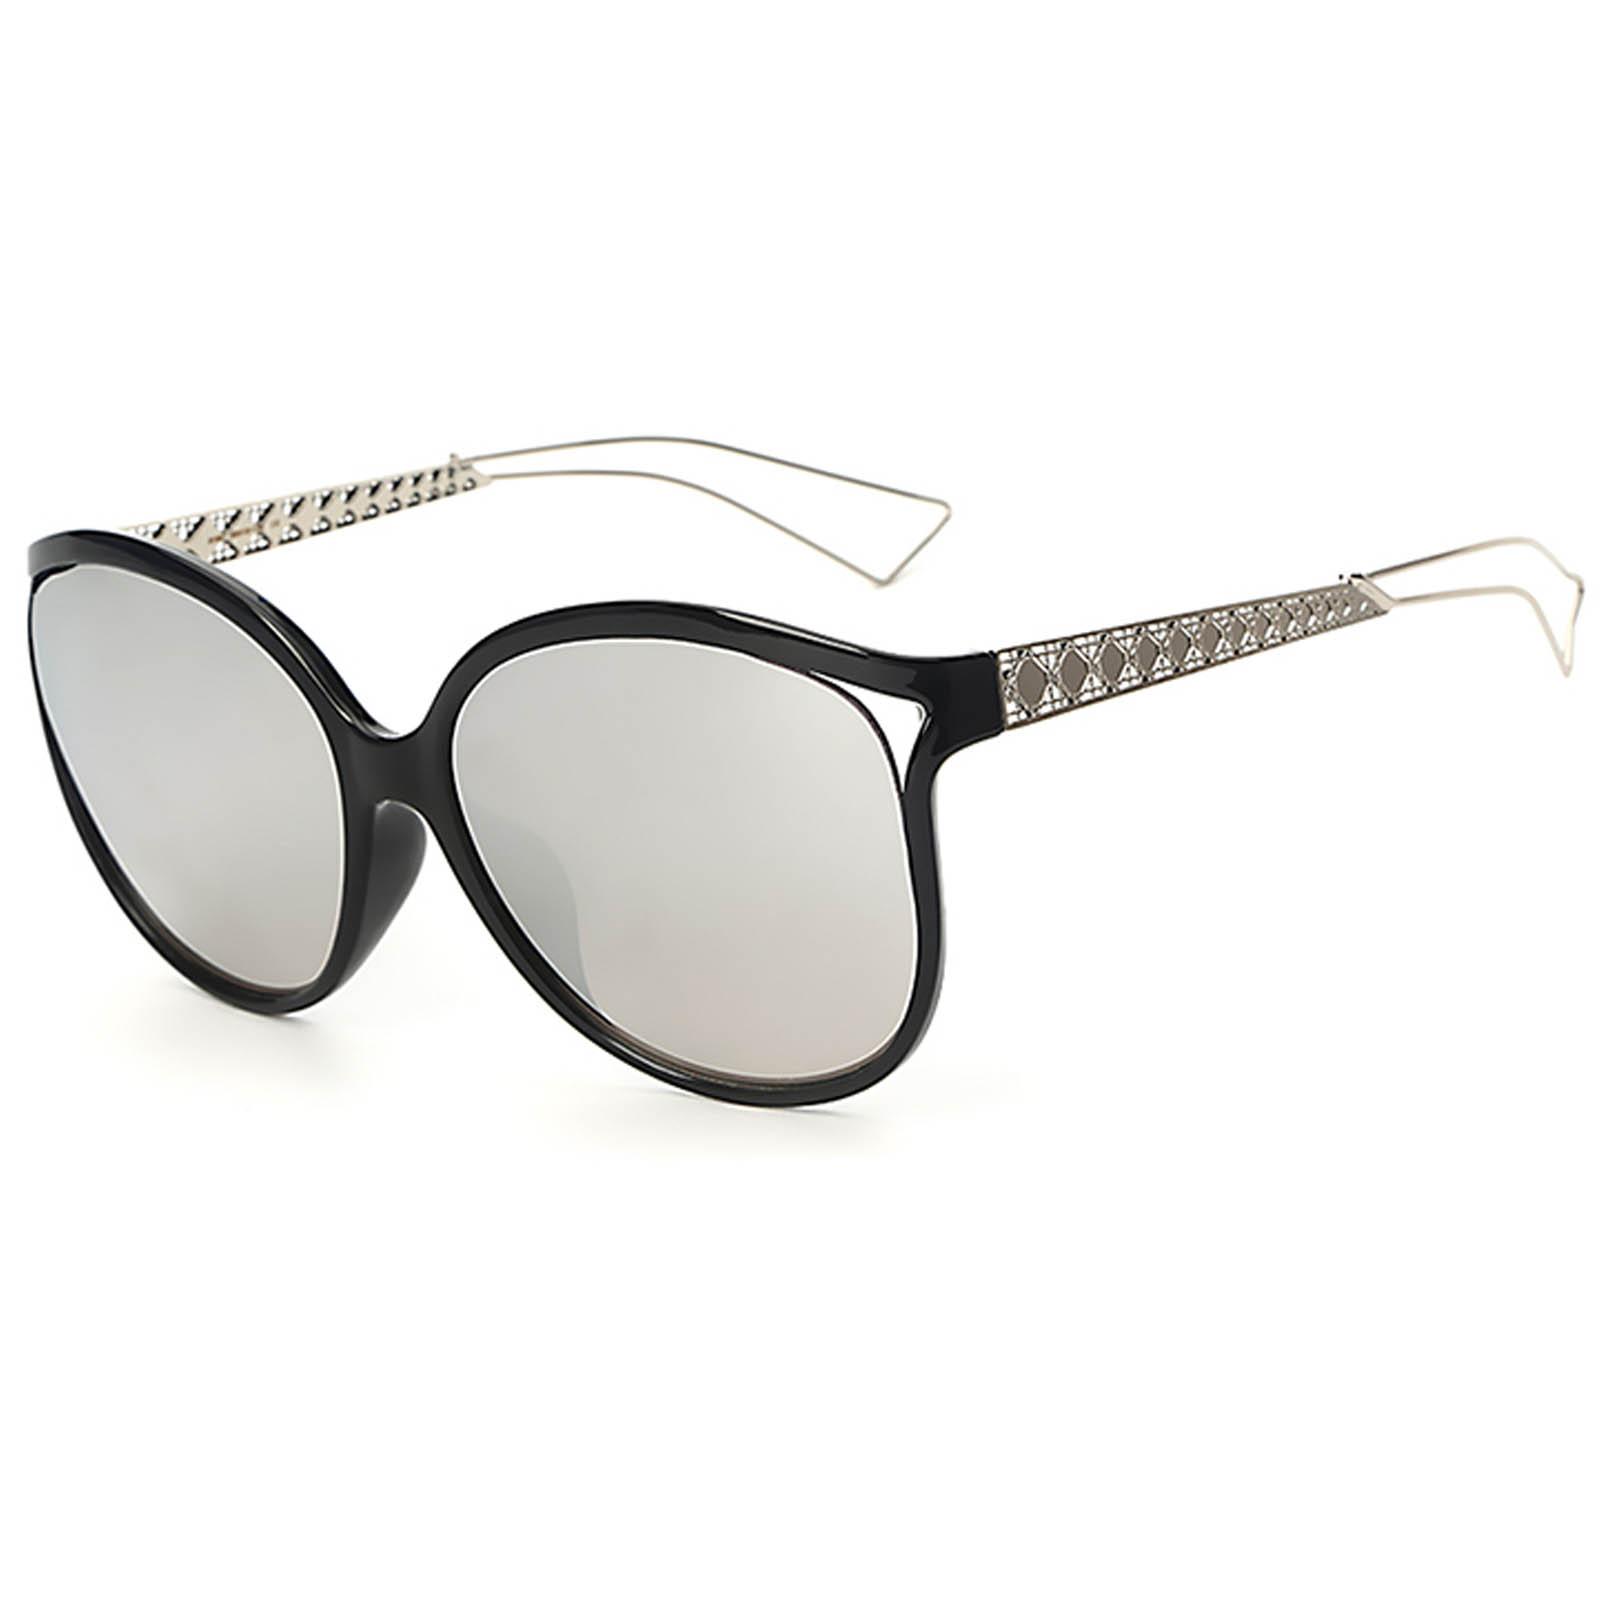 OWL ® 004 C6 Eyewear Sunglasses Women\'s Men\'s Metal Black Frame ...